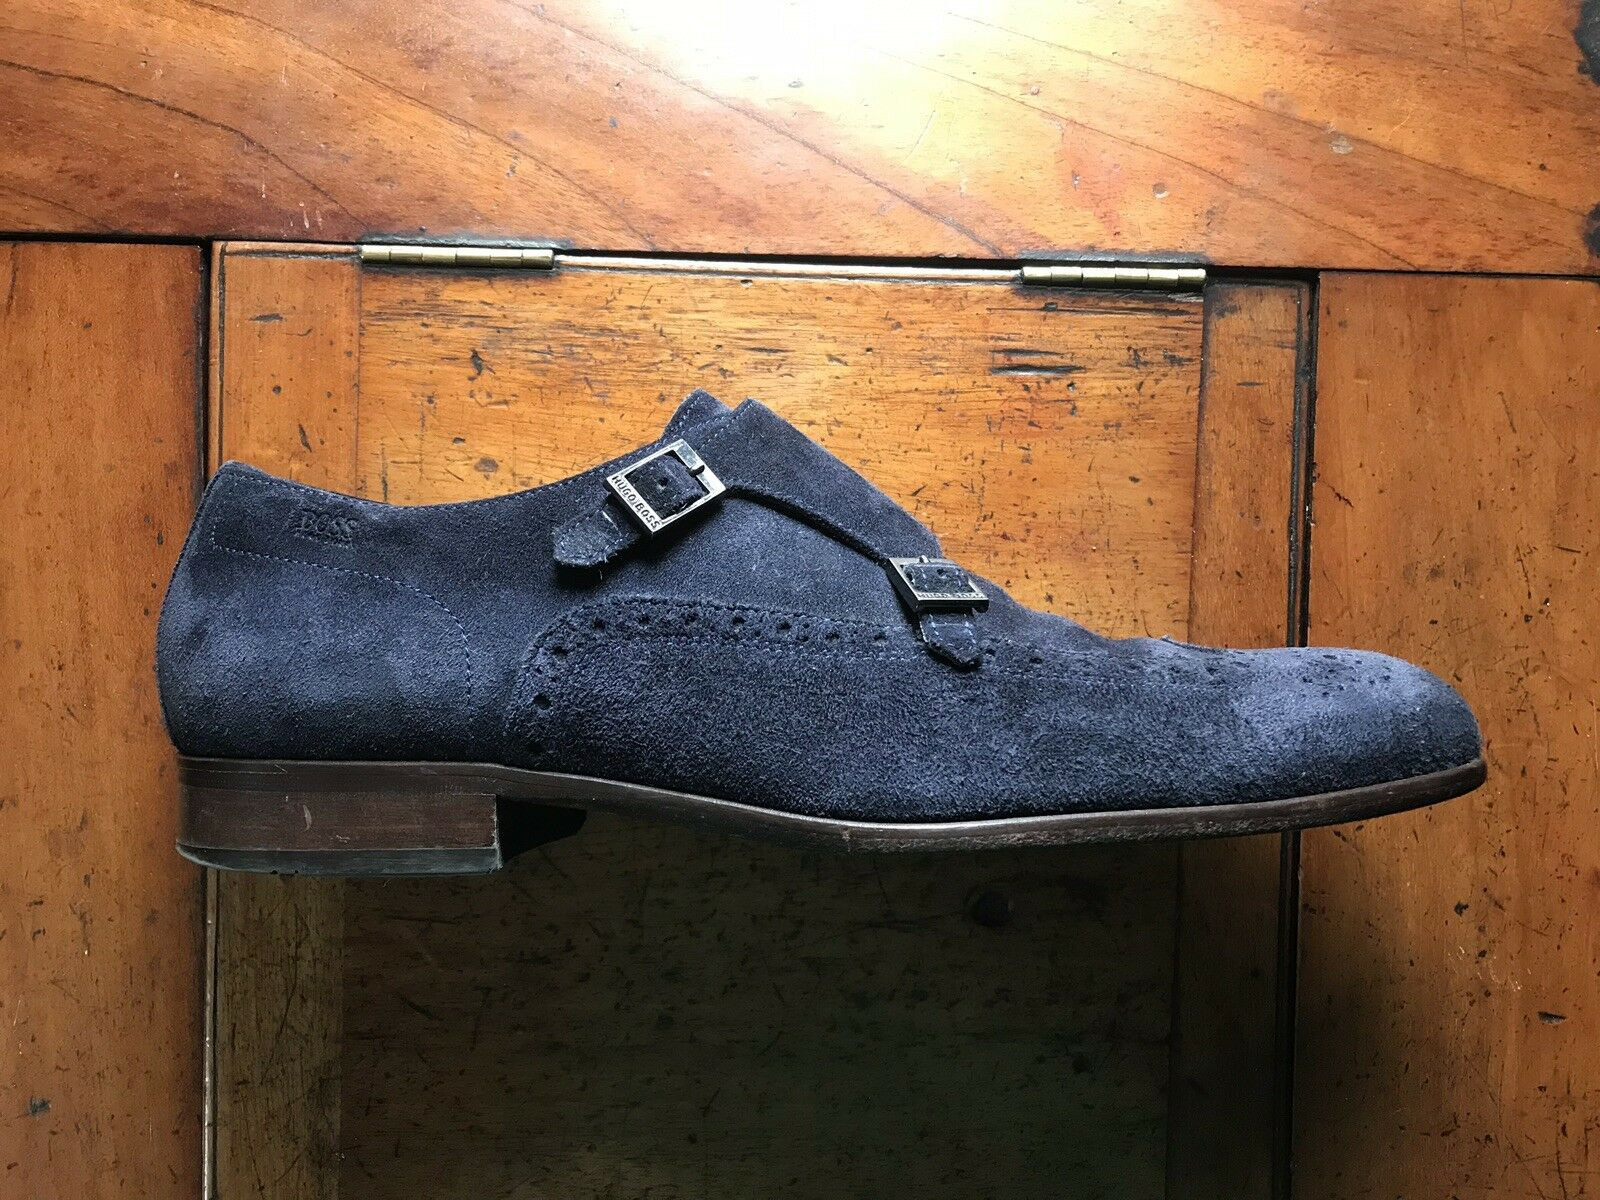 Hugo Boss bluee Suede shoes 9